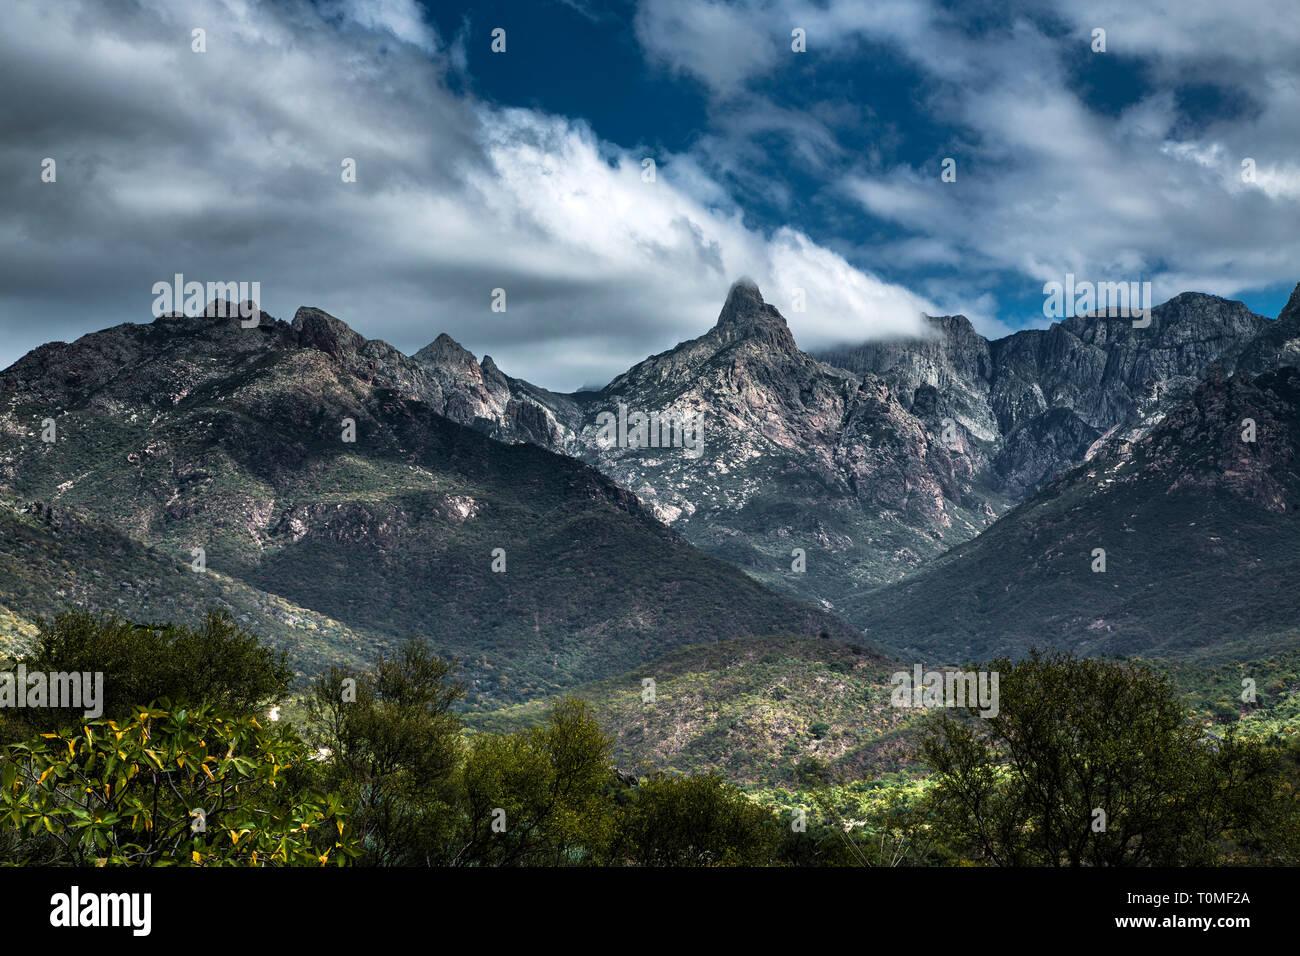 Hajhir mountains, Socotra island, Yemen - Stock Image